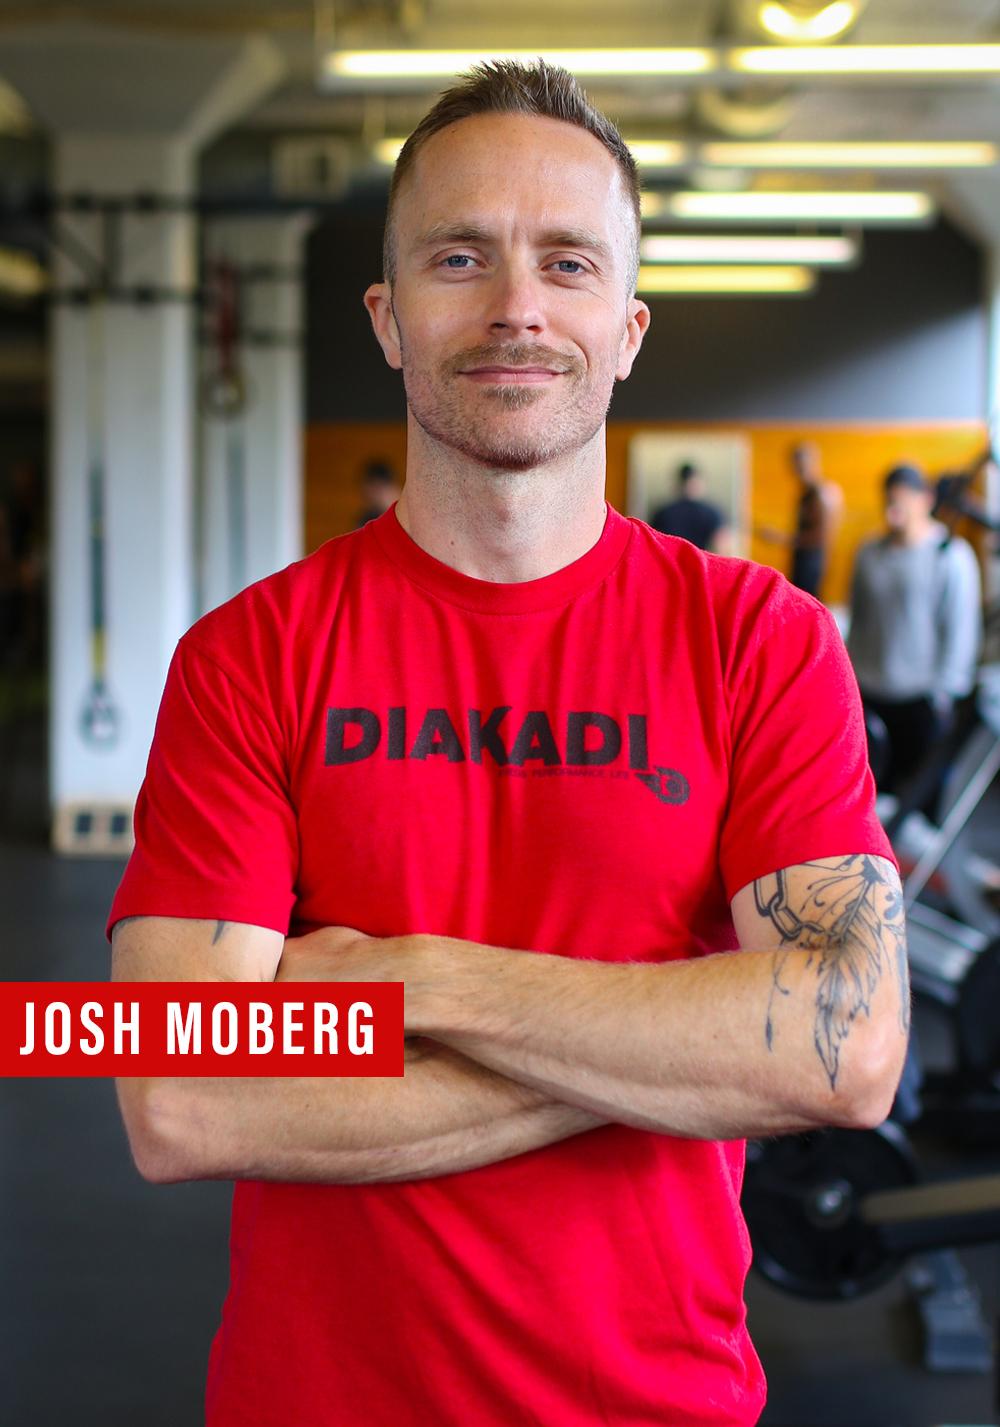 josh-moberg-personal-trainer.jpg